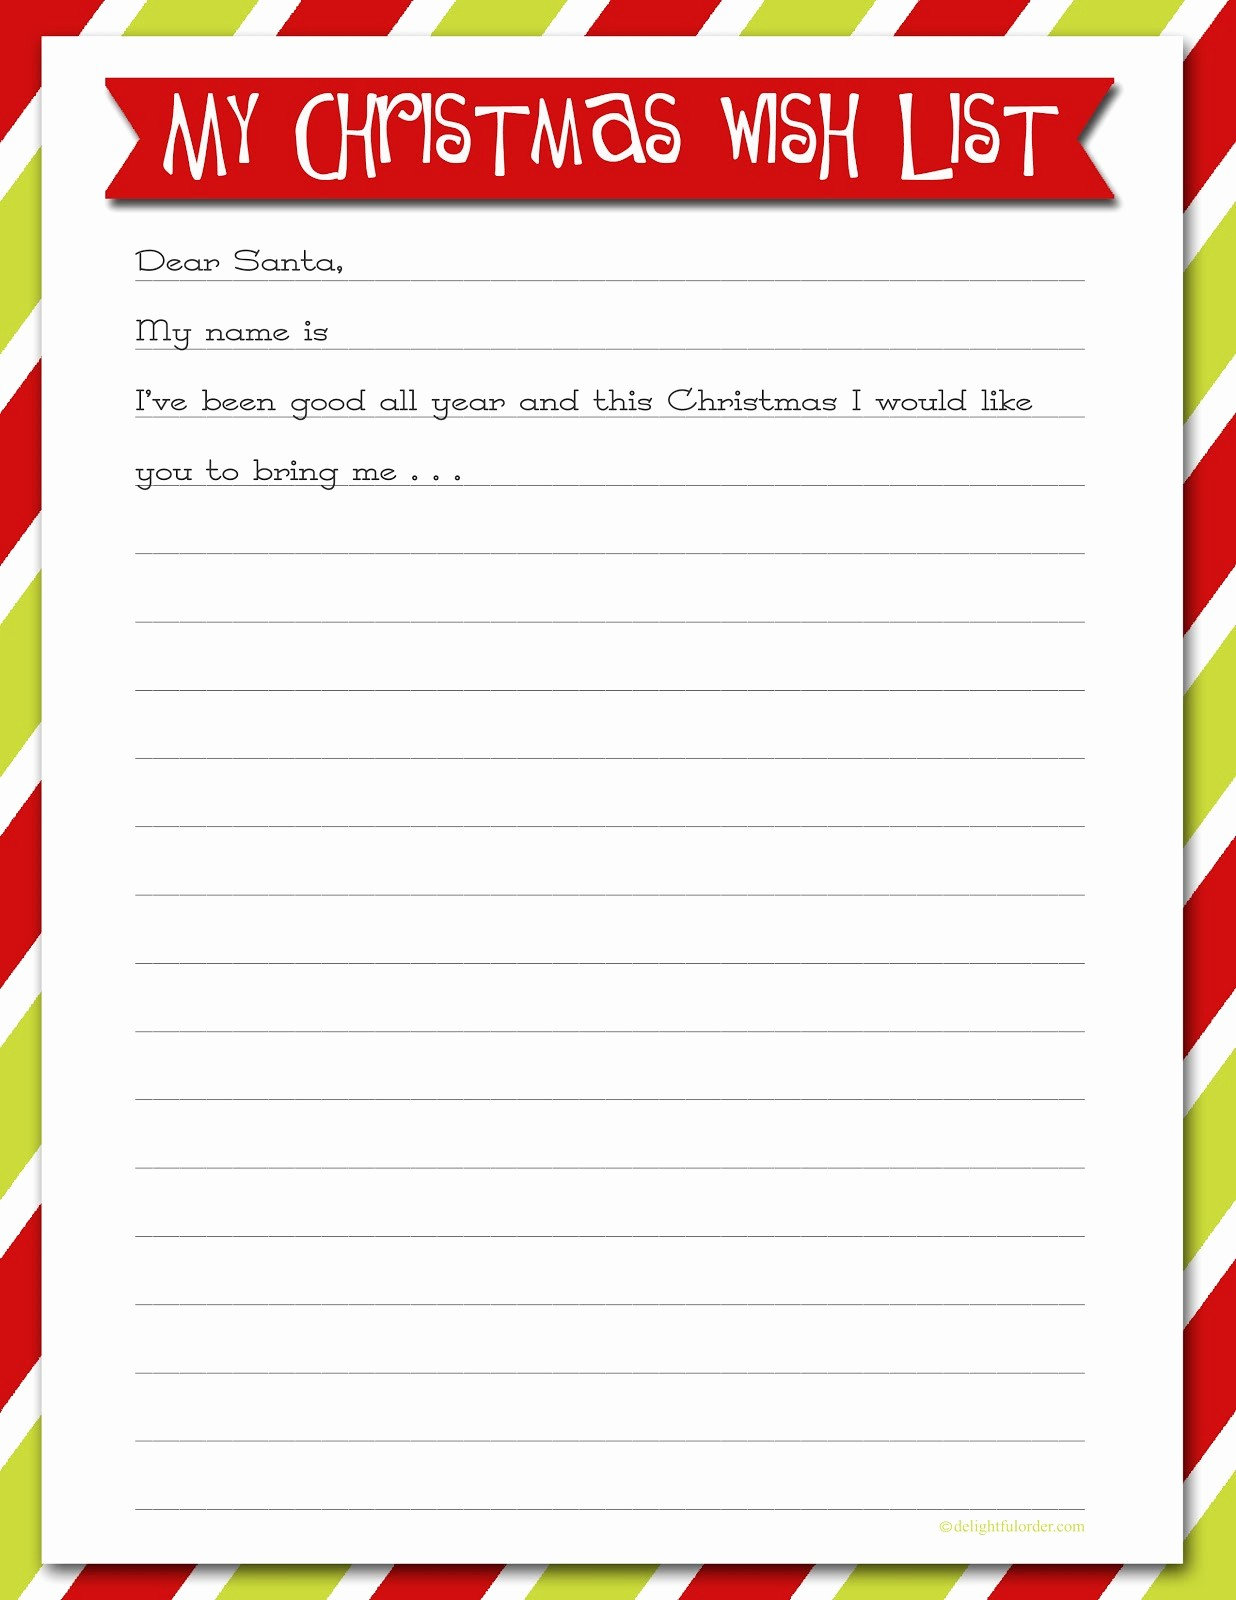 Wish List Template Microsoft Word Elegant Christmas List Template